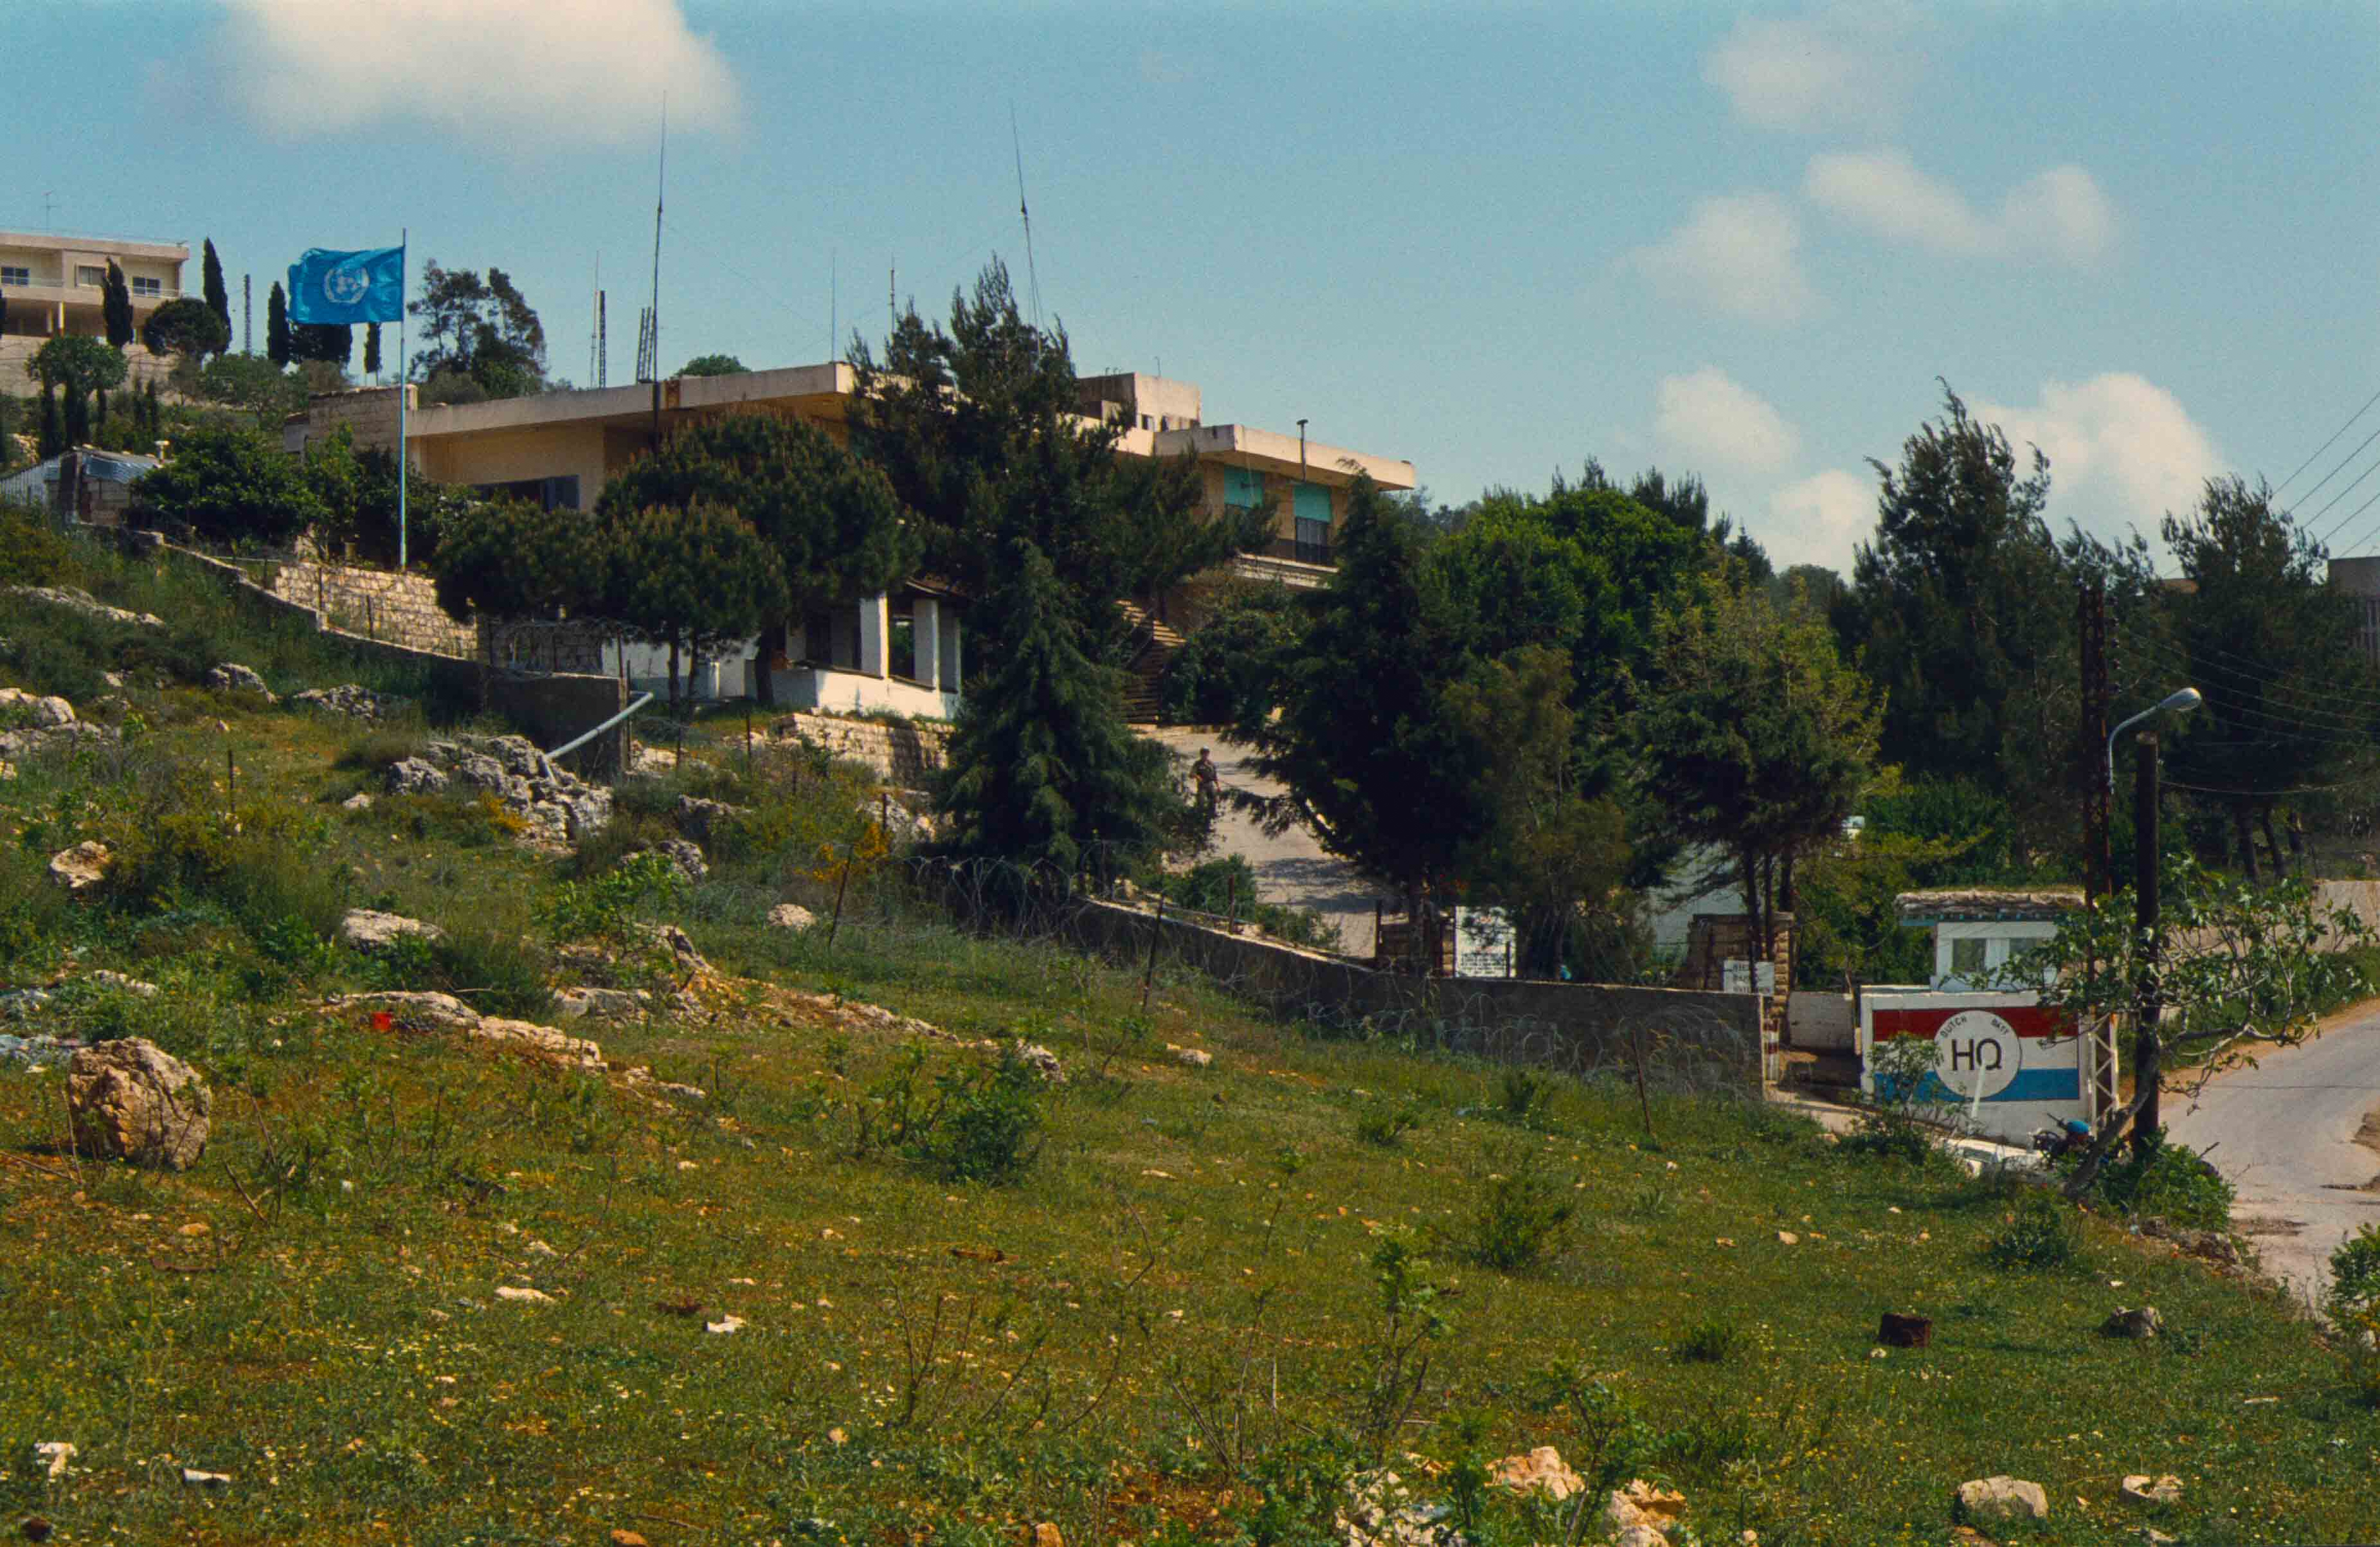 93. Libanon